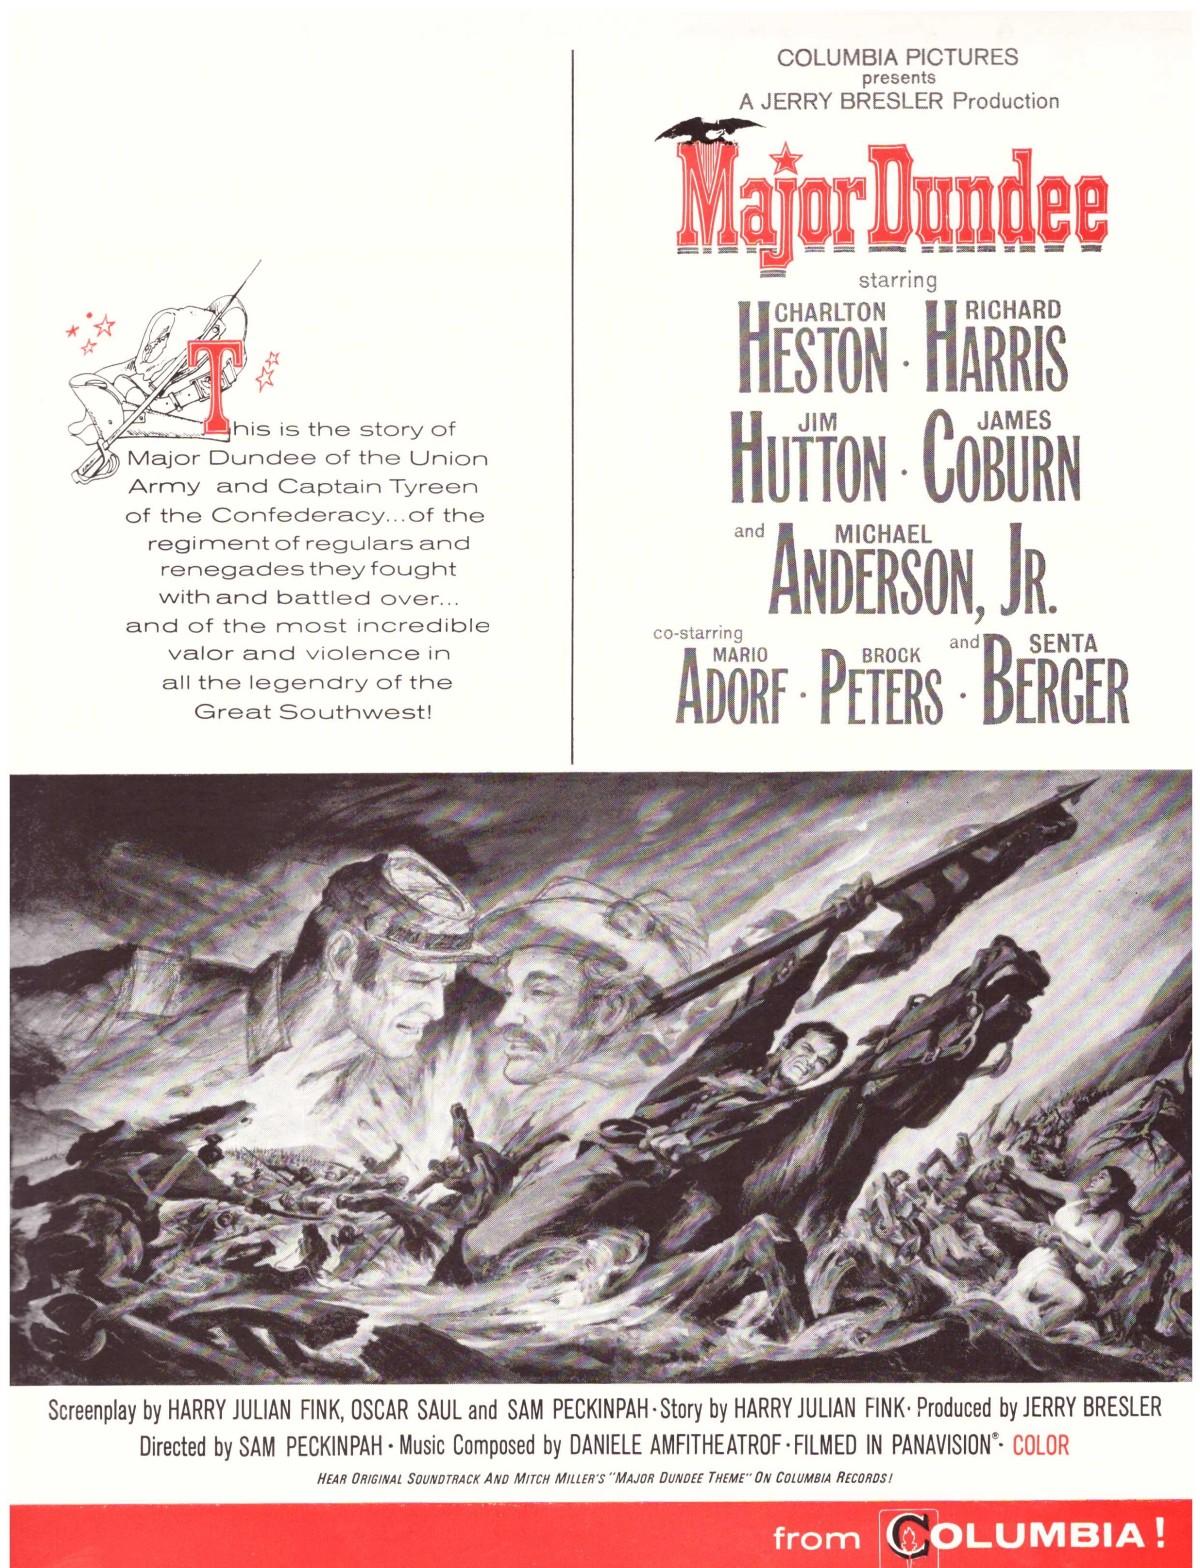 Major Dundee (1965)***